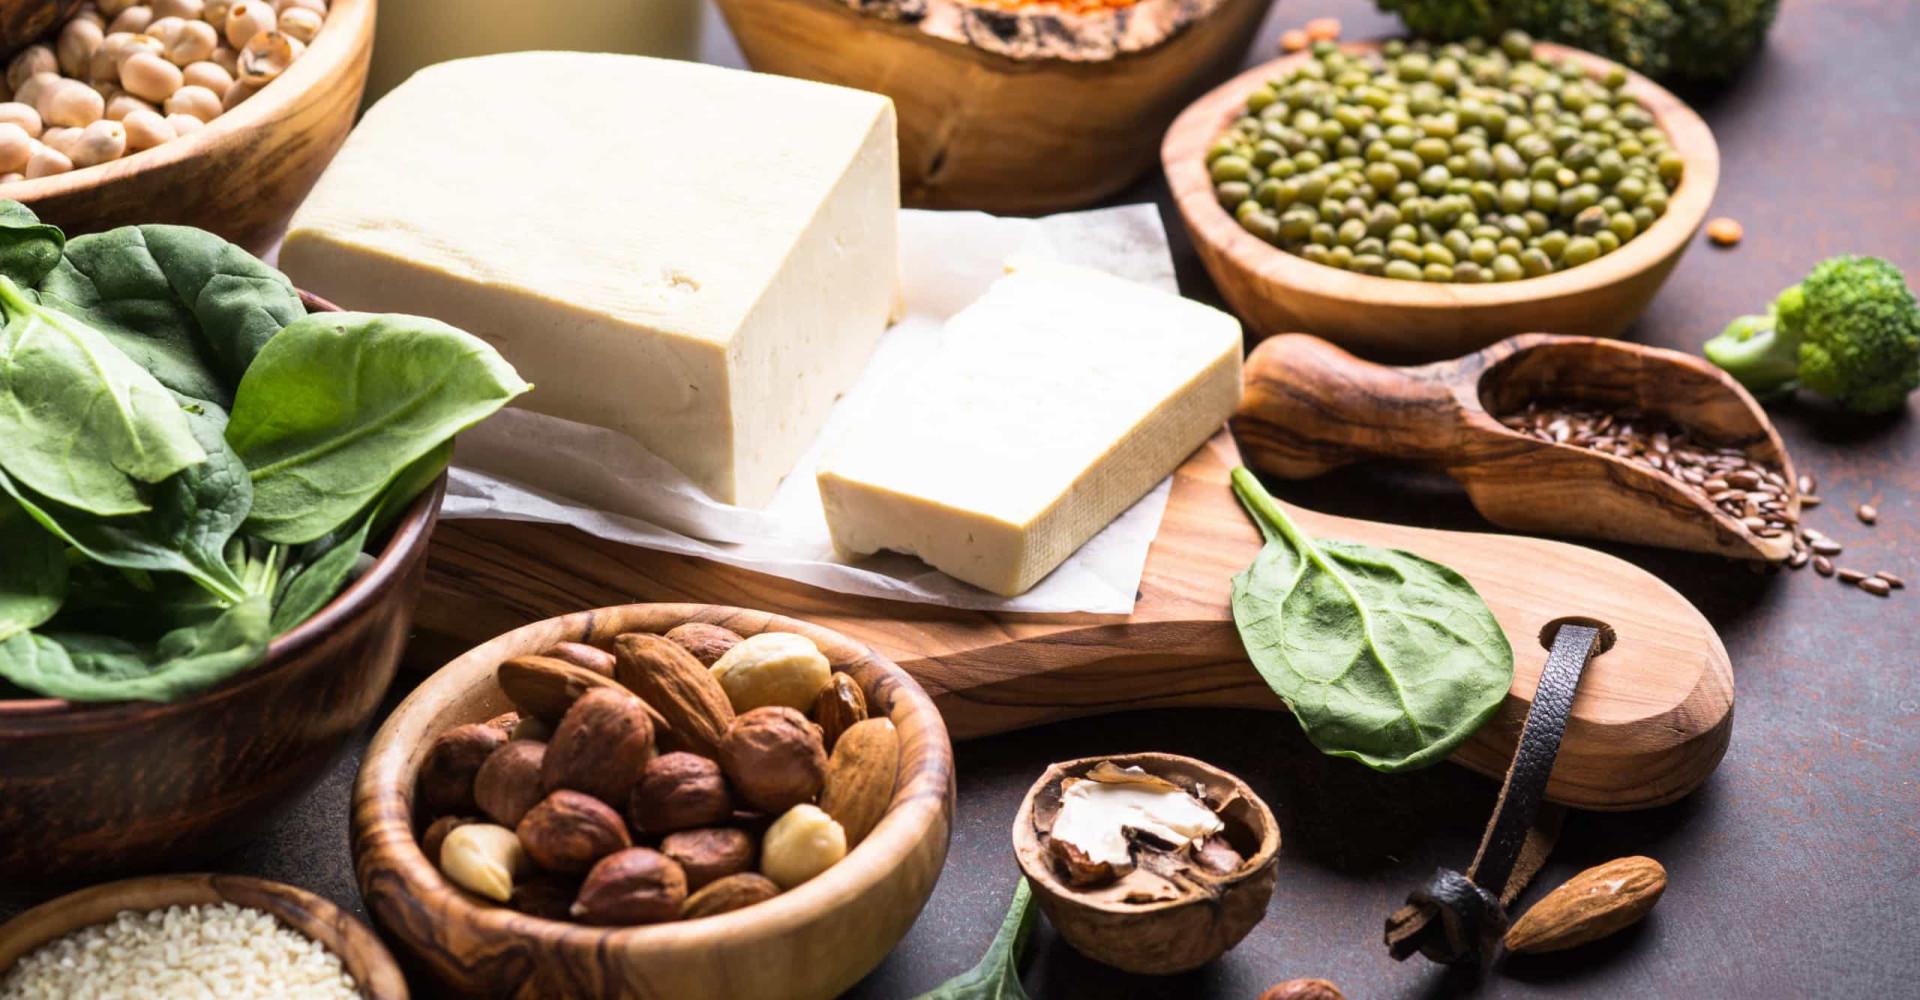 Vegan voedsel bomvol eiwitten